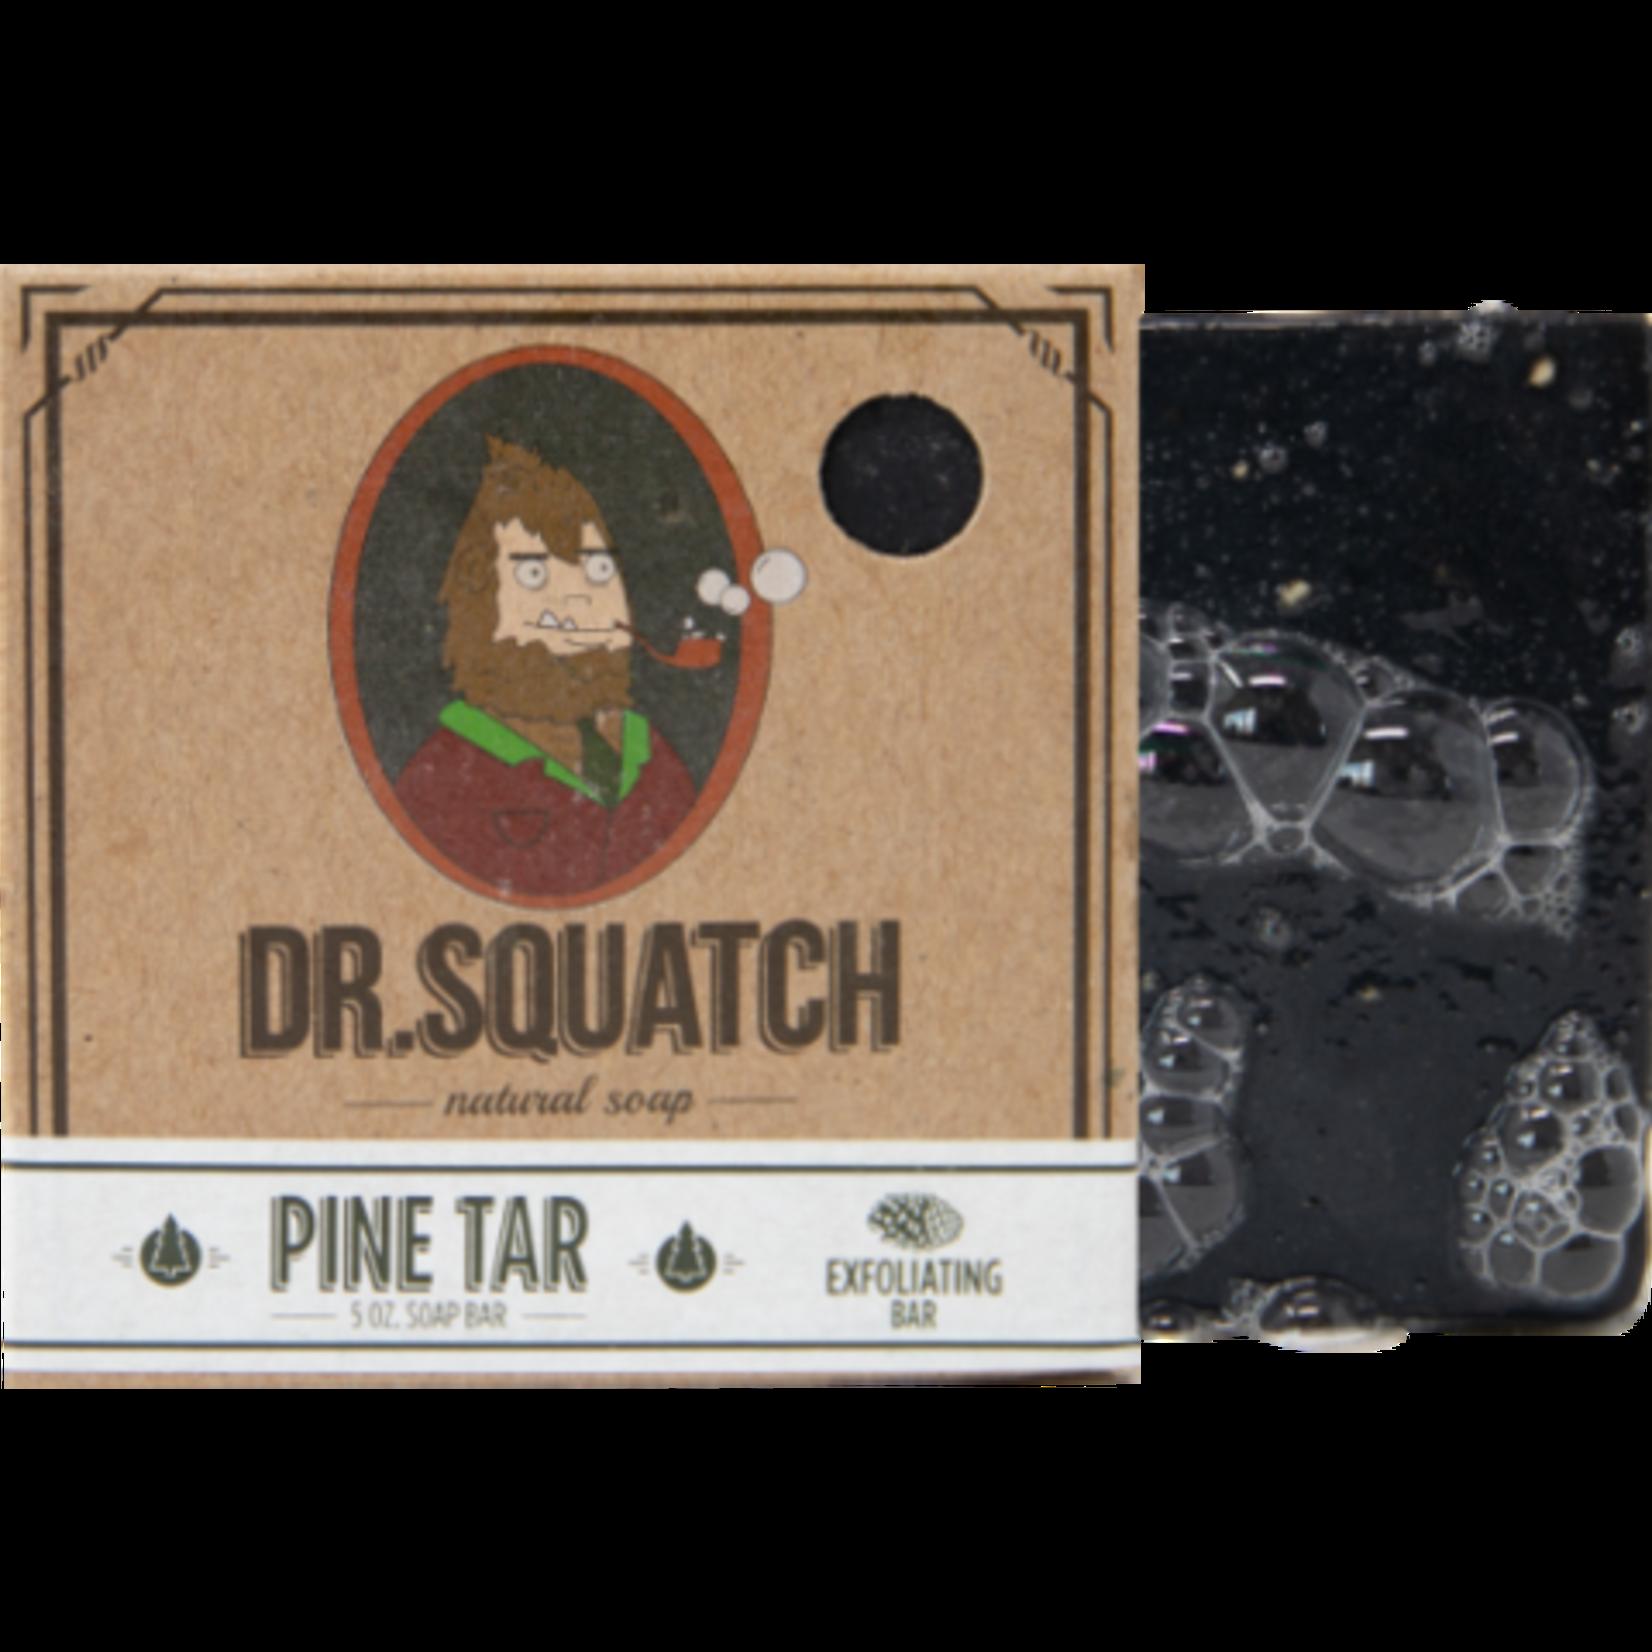 Dr Squatch Bar Soap 5 oz - Pine Tar